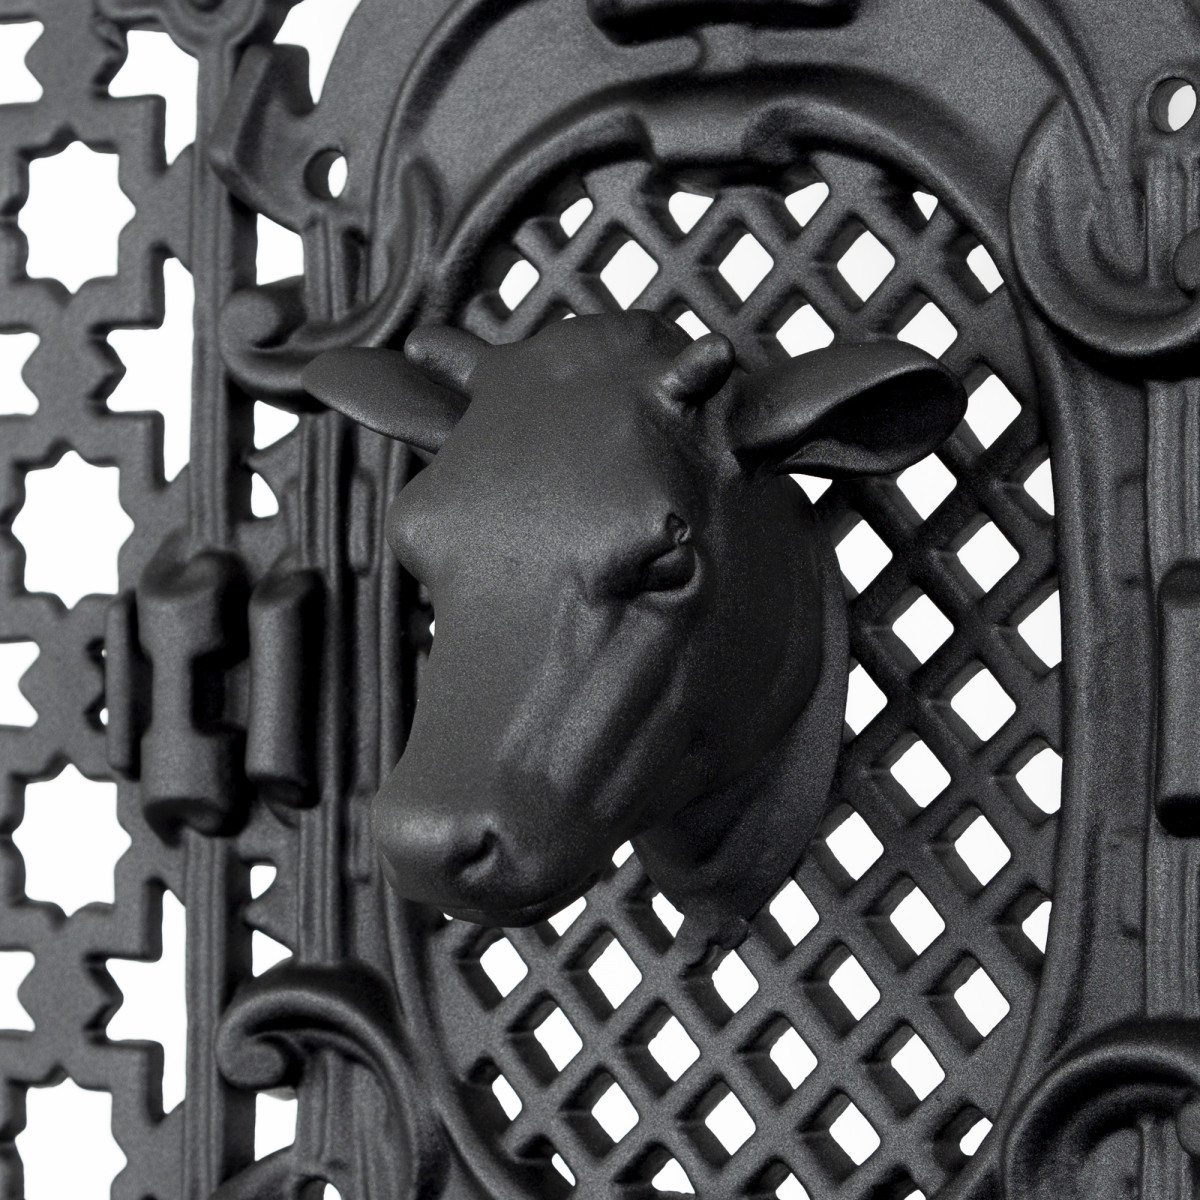 Koeienkop aluminium 11,5 x 13